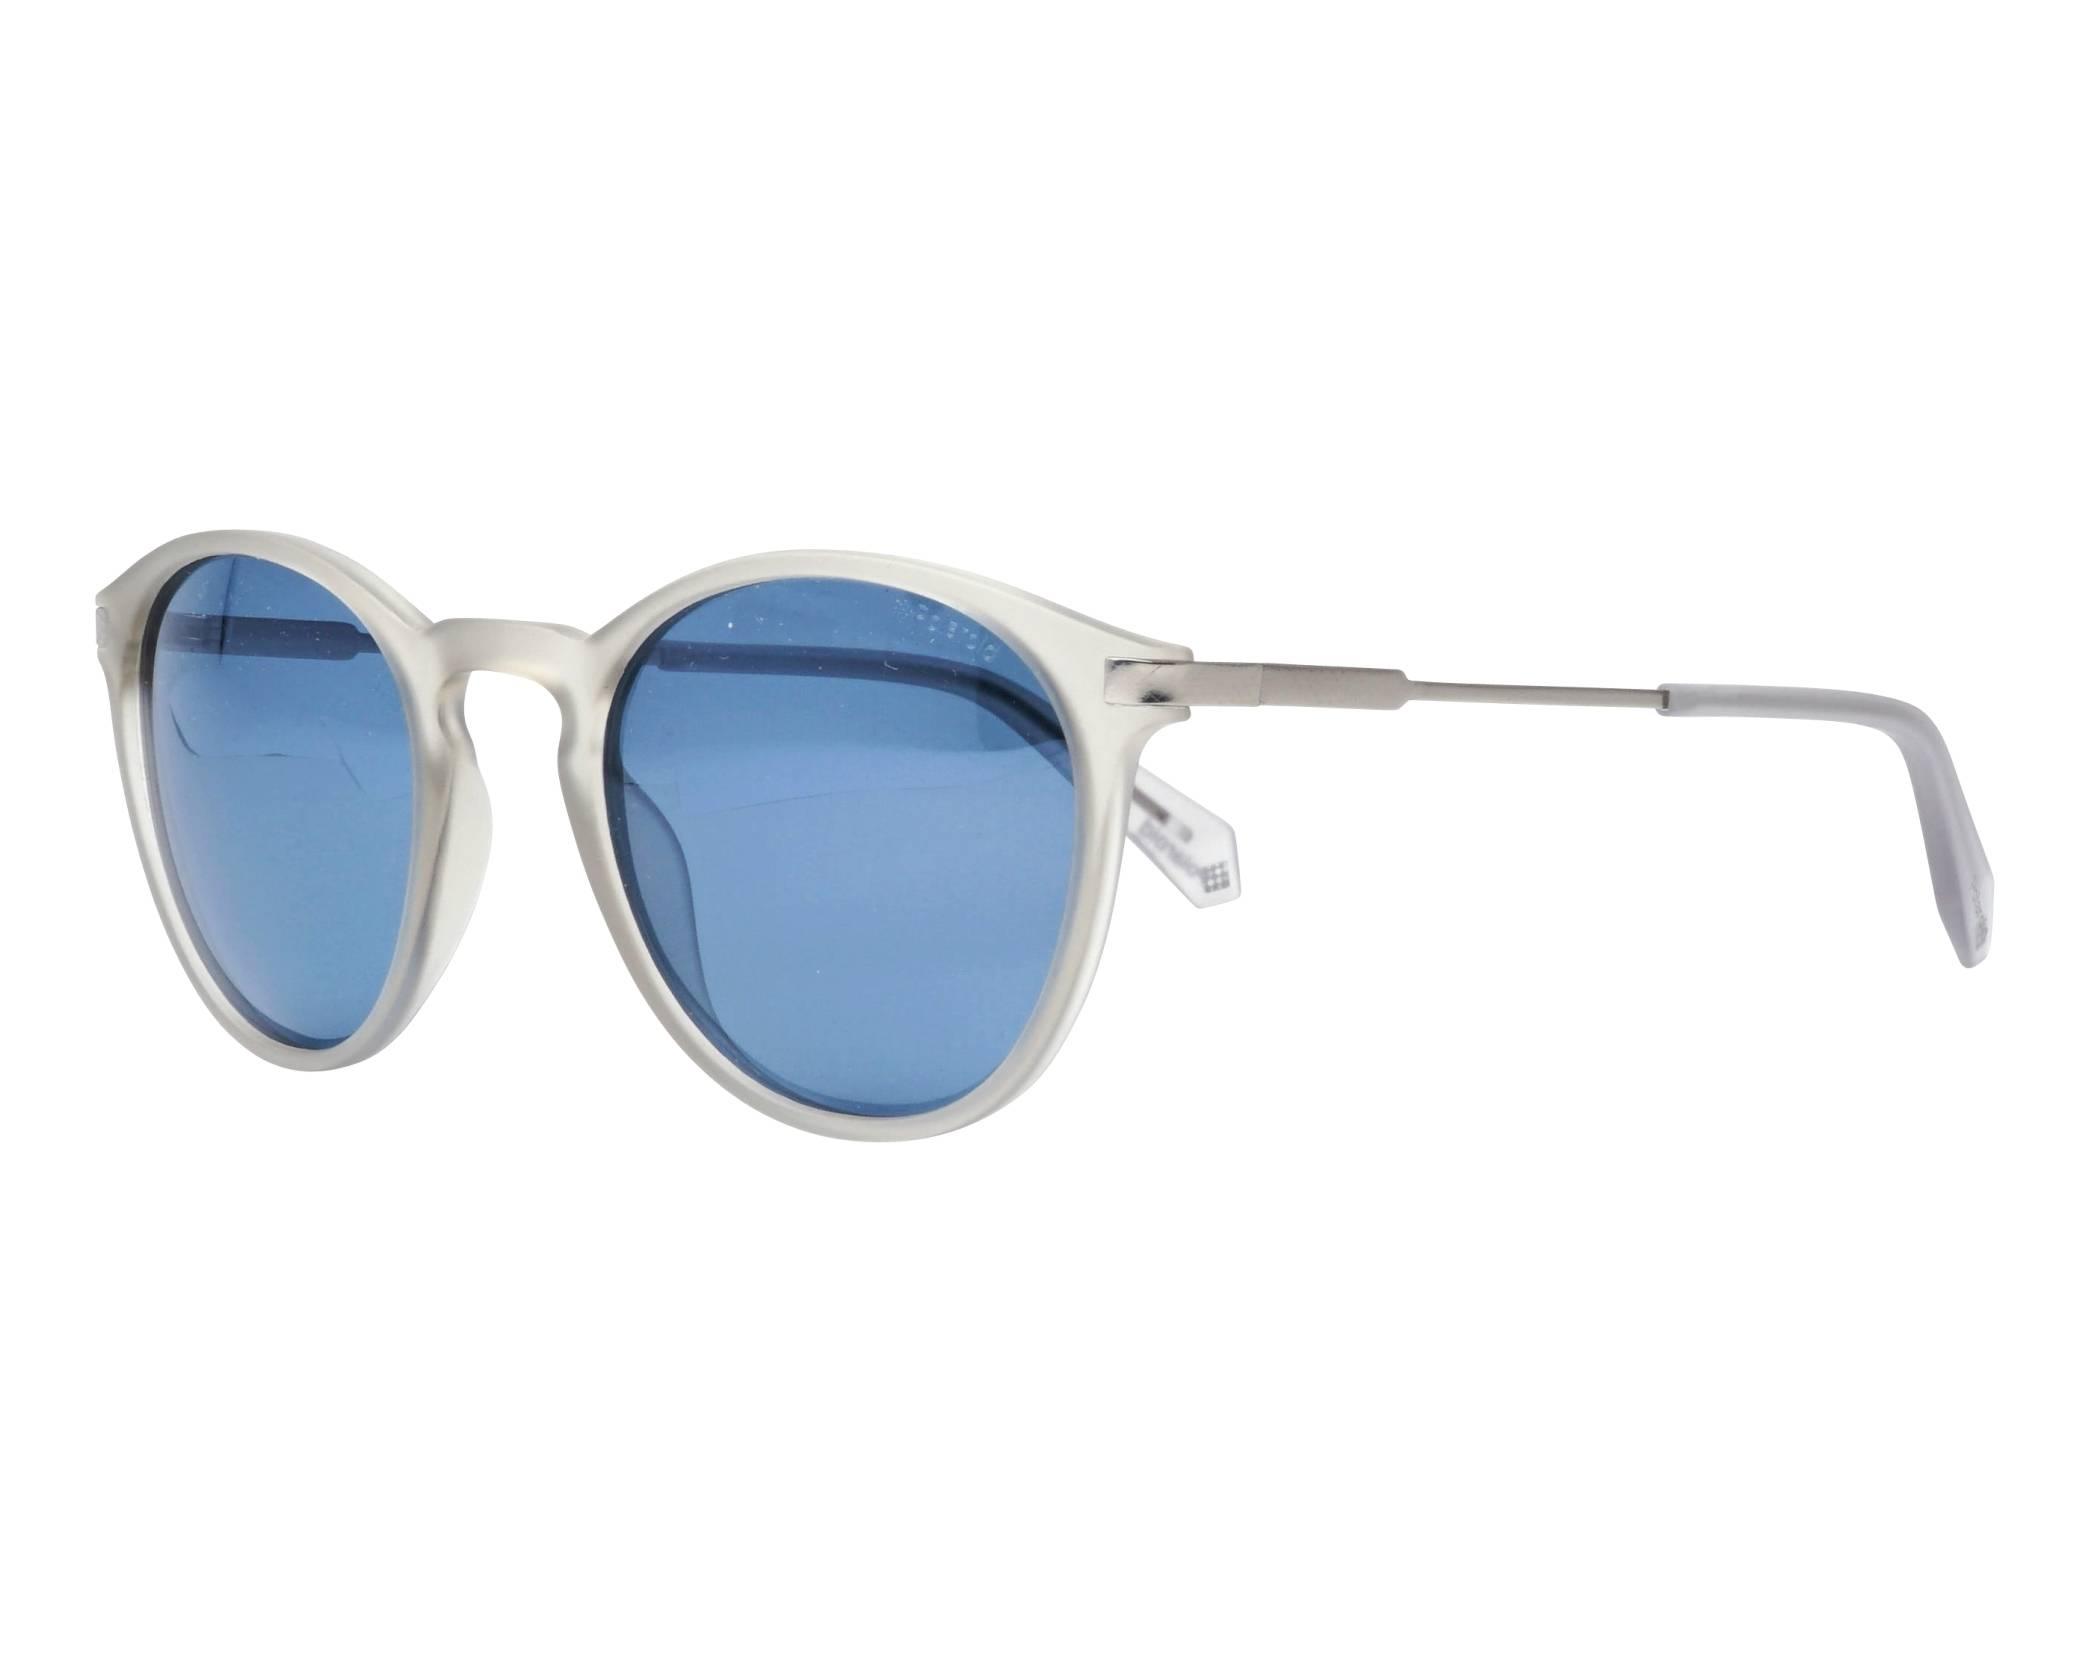 9a703885bbb Sunglasses Polaroid PLD-2062-S RIWXN 50-22 Crystal Gun profile view